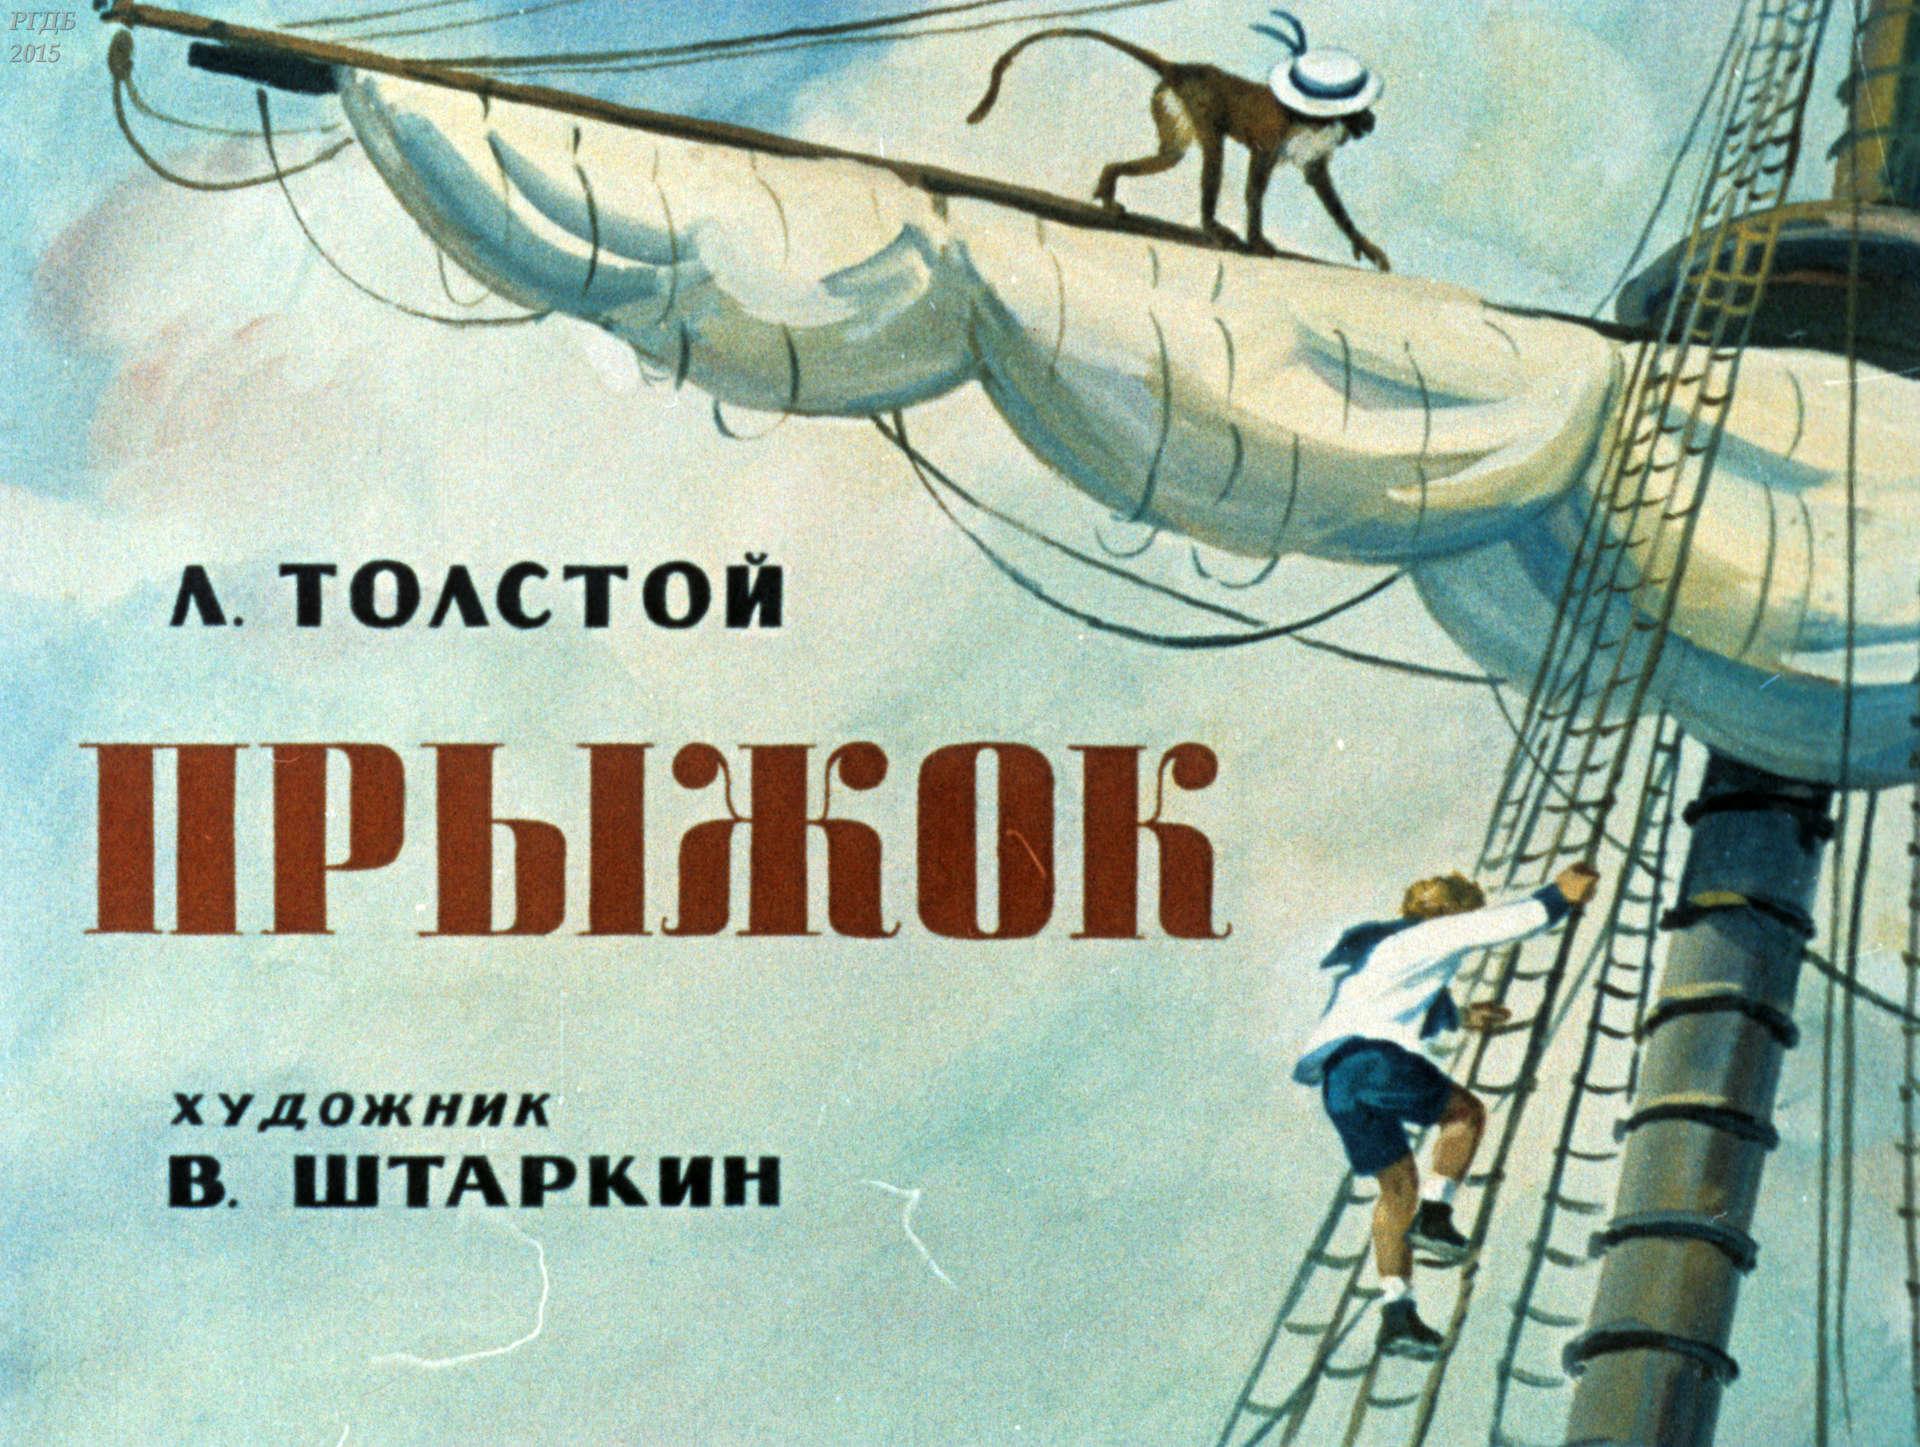 Читать quotЕвгений Онегинquot  Пушкин Александр